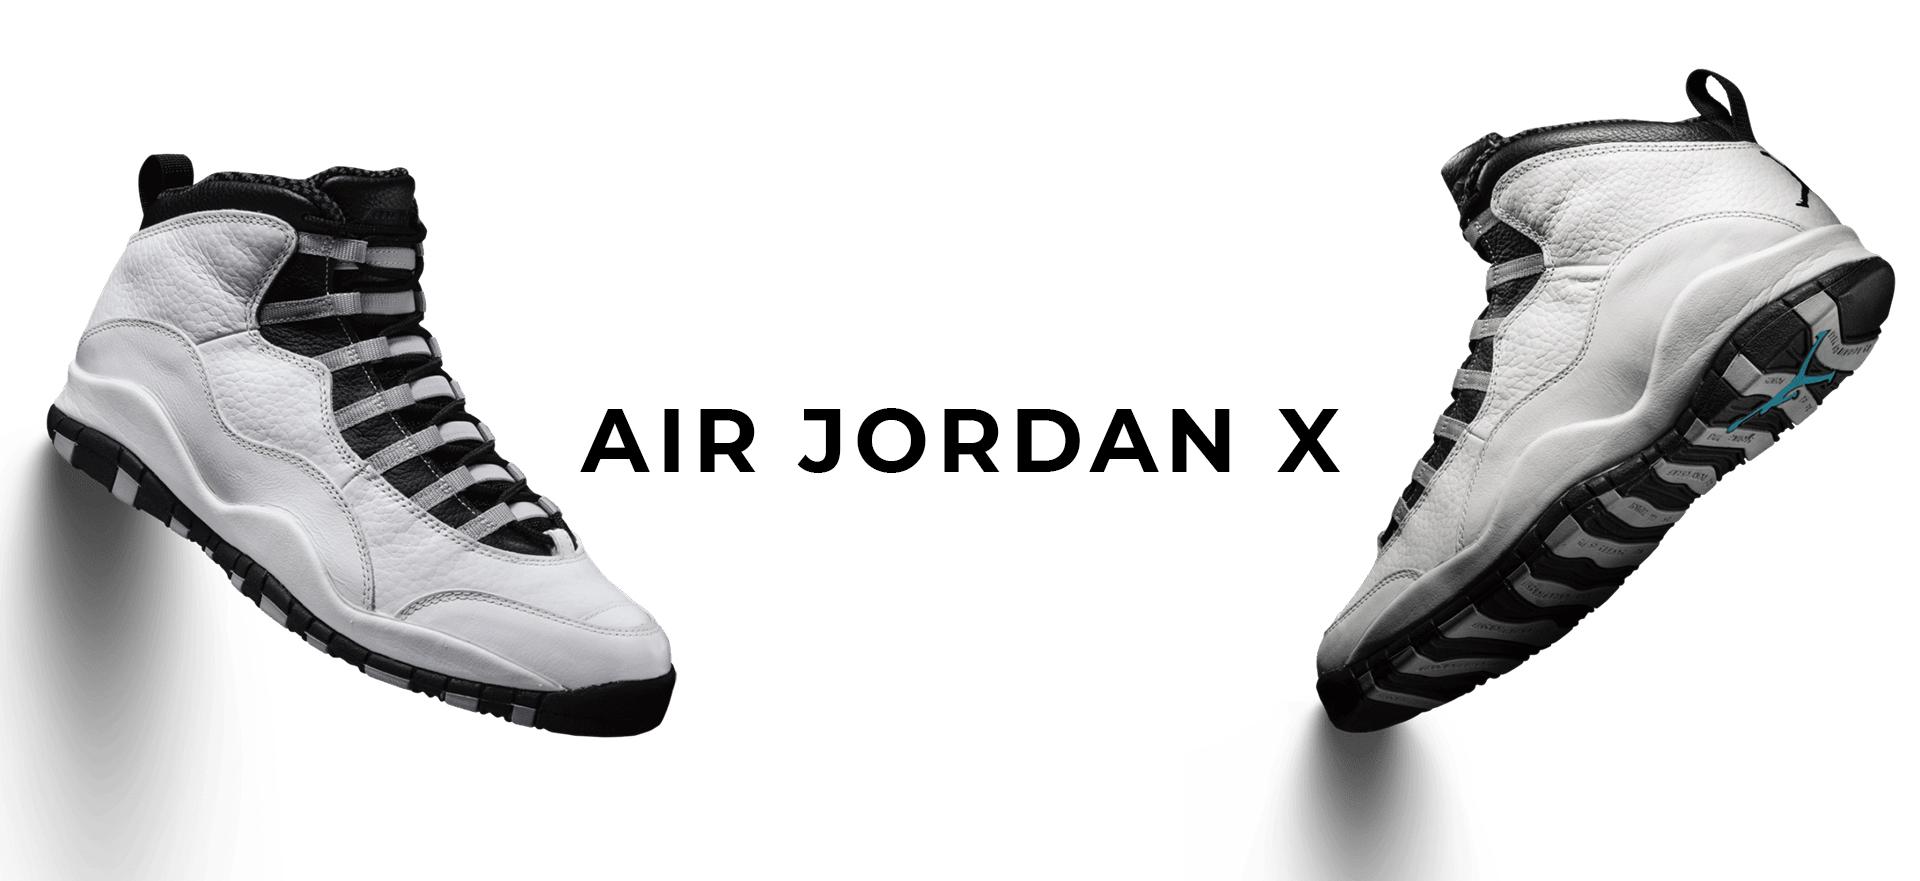 Air Jordan 10 — mcmag.ru — все модели джордан